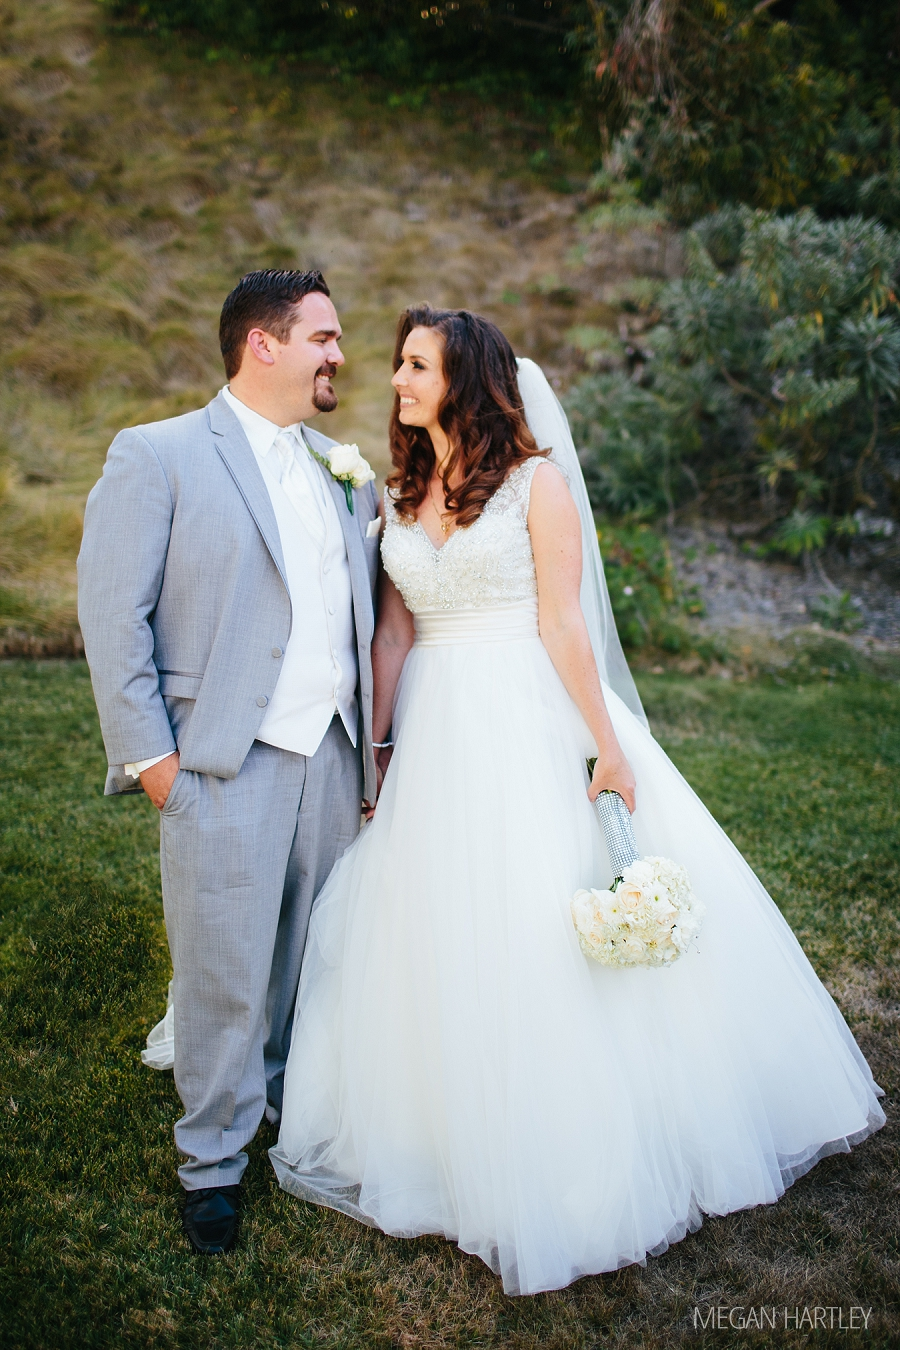 Megan Hartley Photography Palos Verdes Norris Center Wedding Photographer 00044